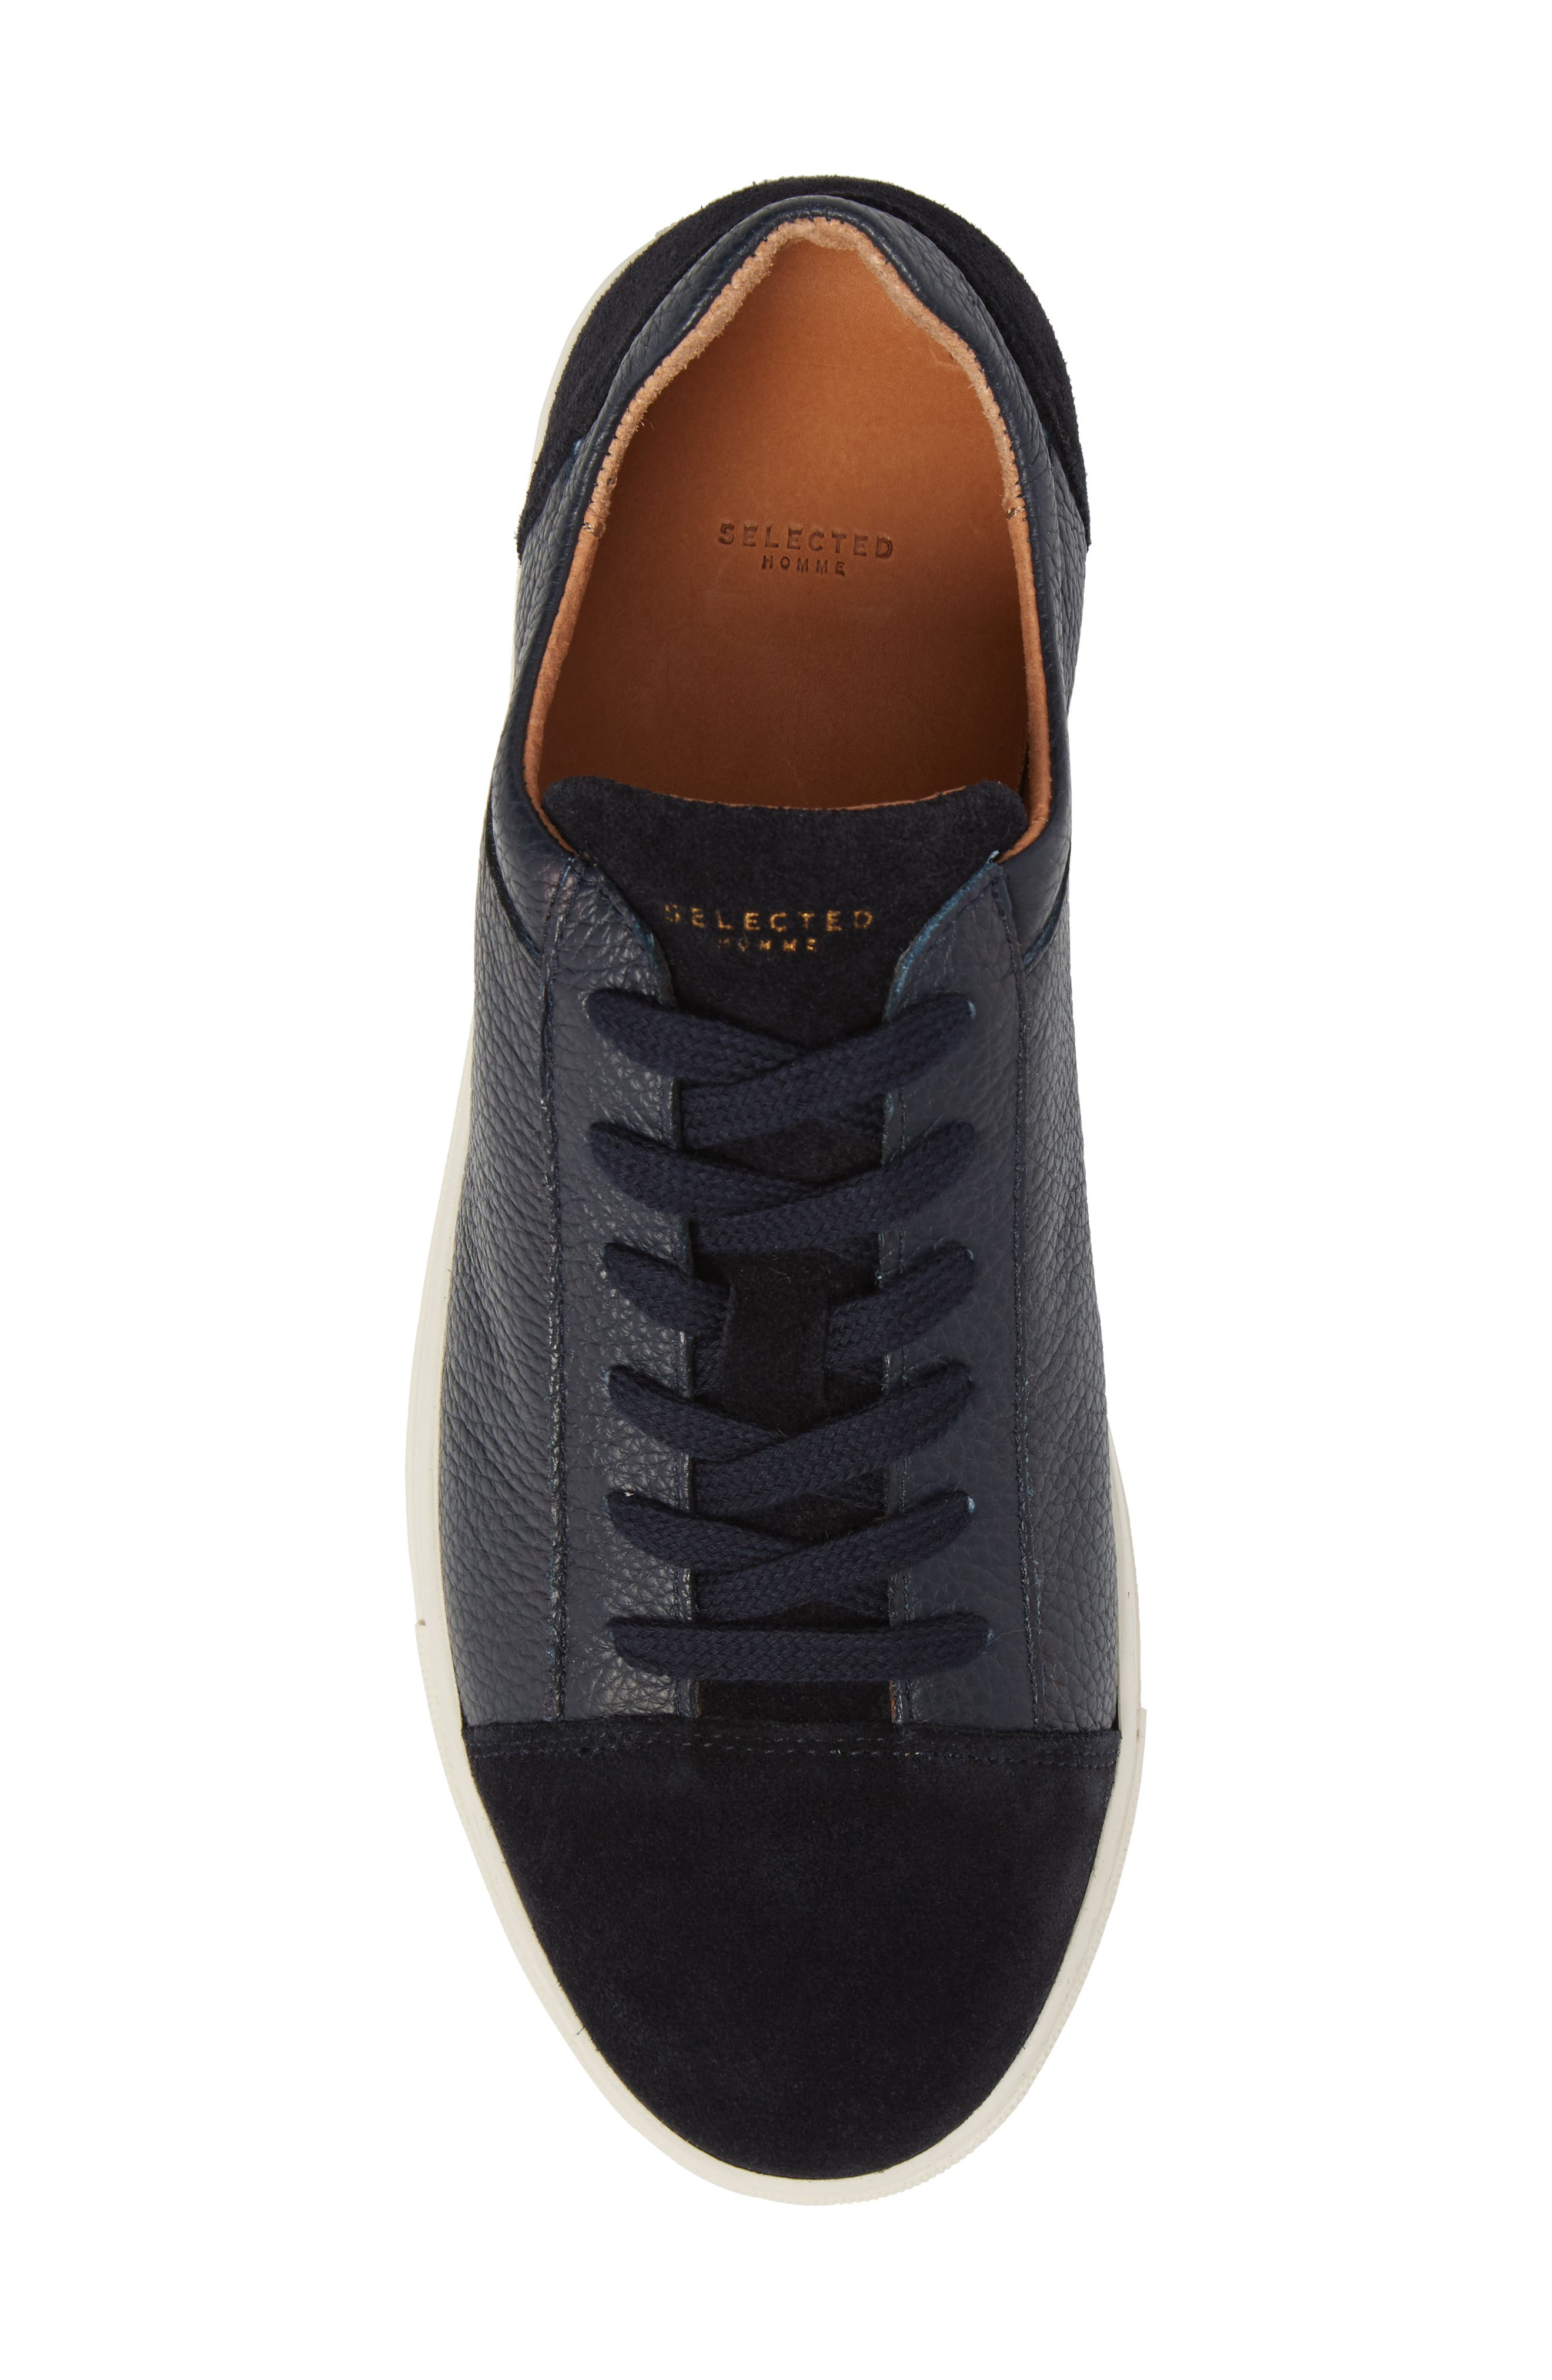 David Cap Toe Sneaker,                             Alternate thumbnail 5, color,                             Dark Navy Leather/ Suede